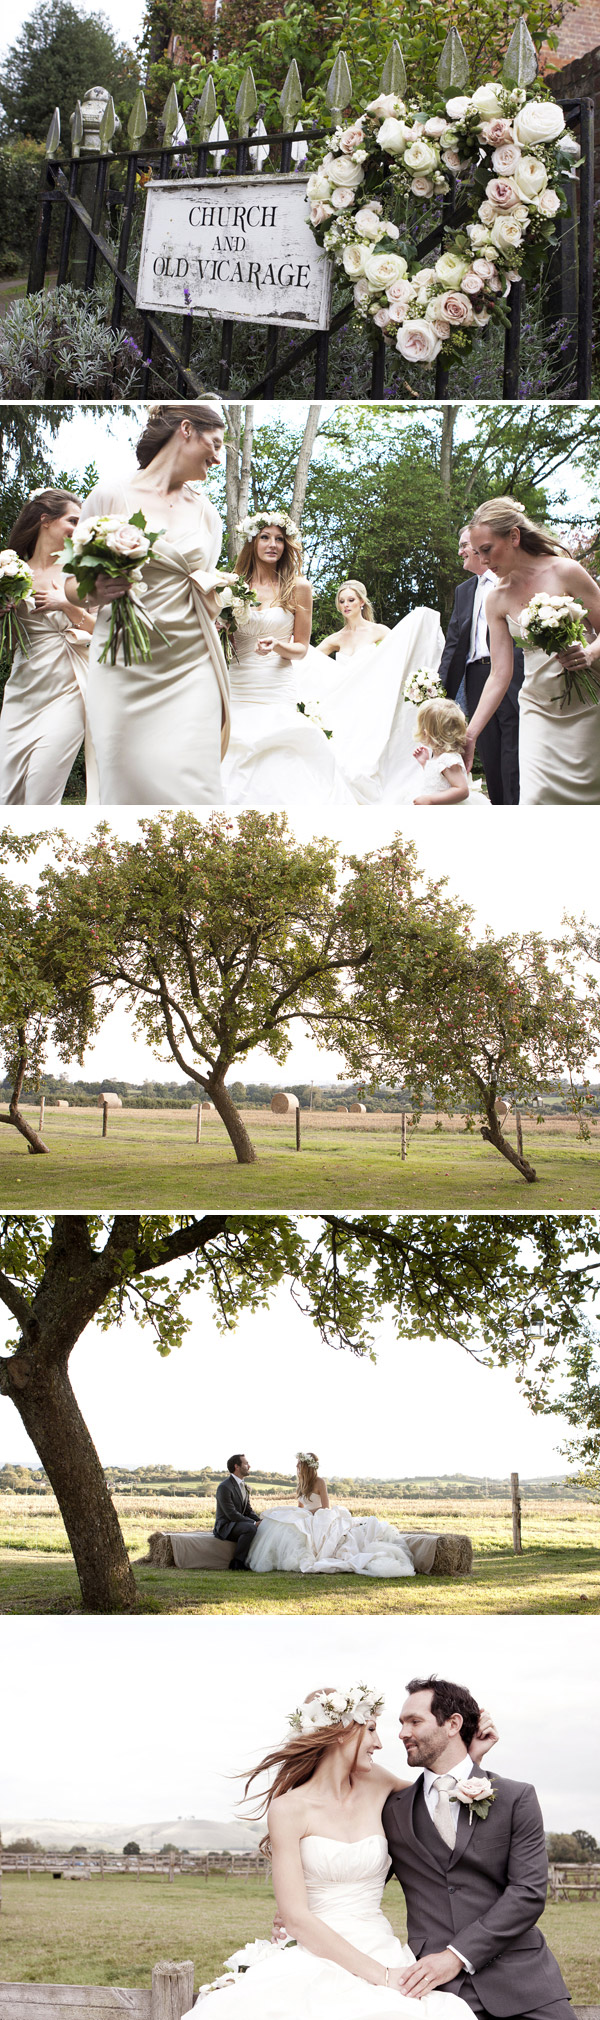 Anna mcdonald wedding